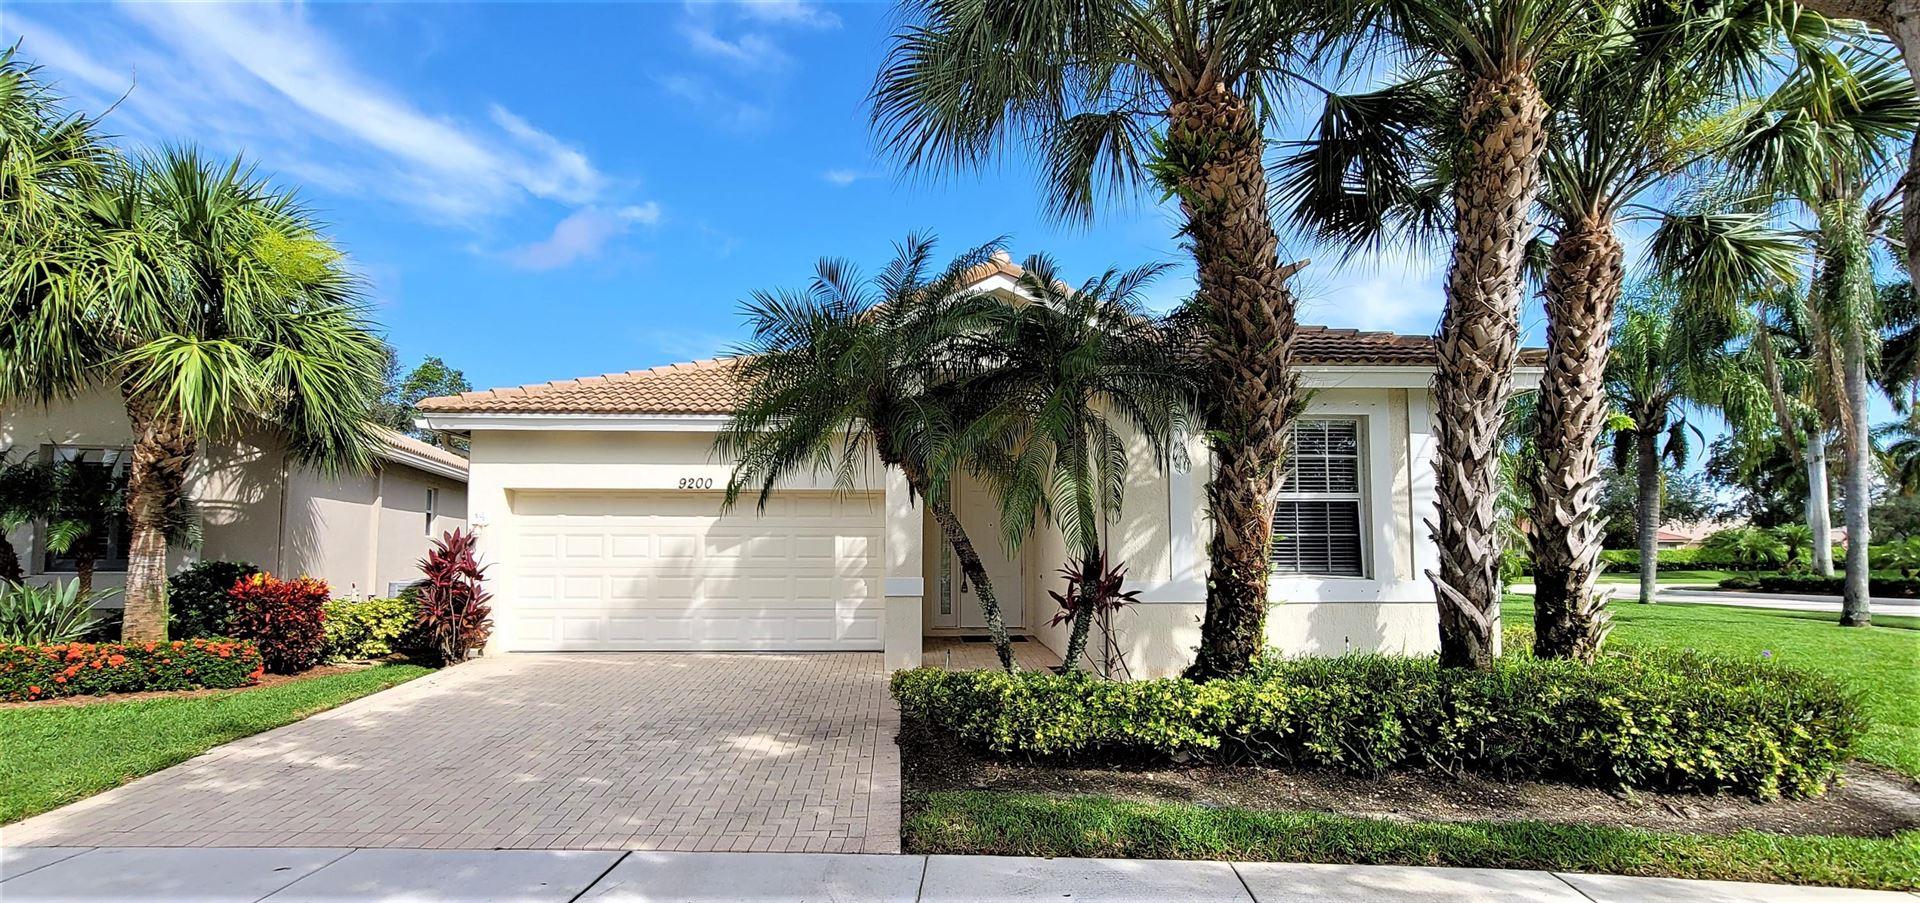 9200 Bay Point Circle, West Palm Beach, FL 33411 - MLS#: RX-10736709